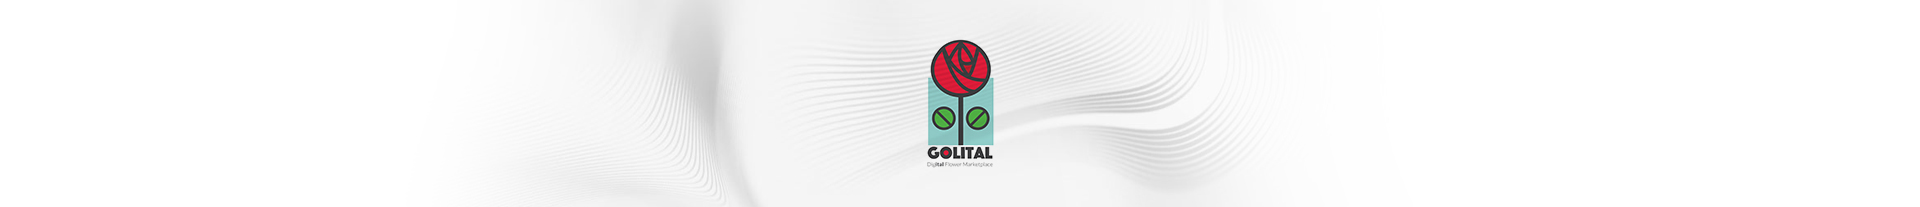 کد تخفیف گلیتال گلفروشی آنلاین